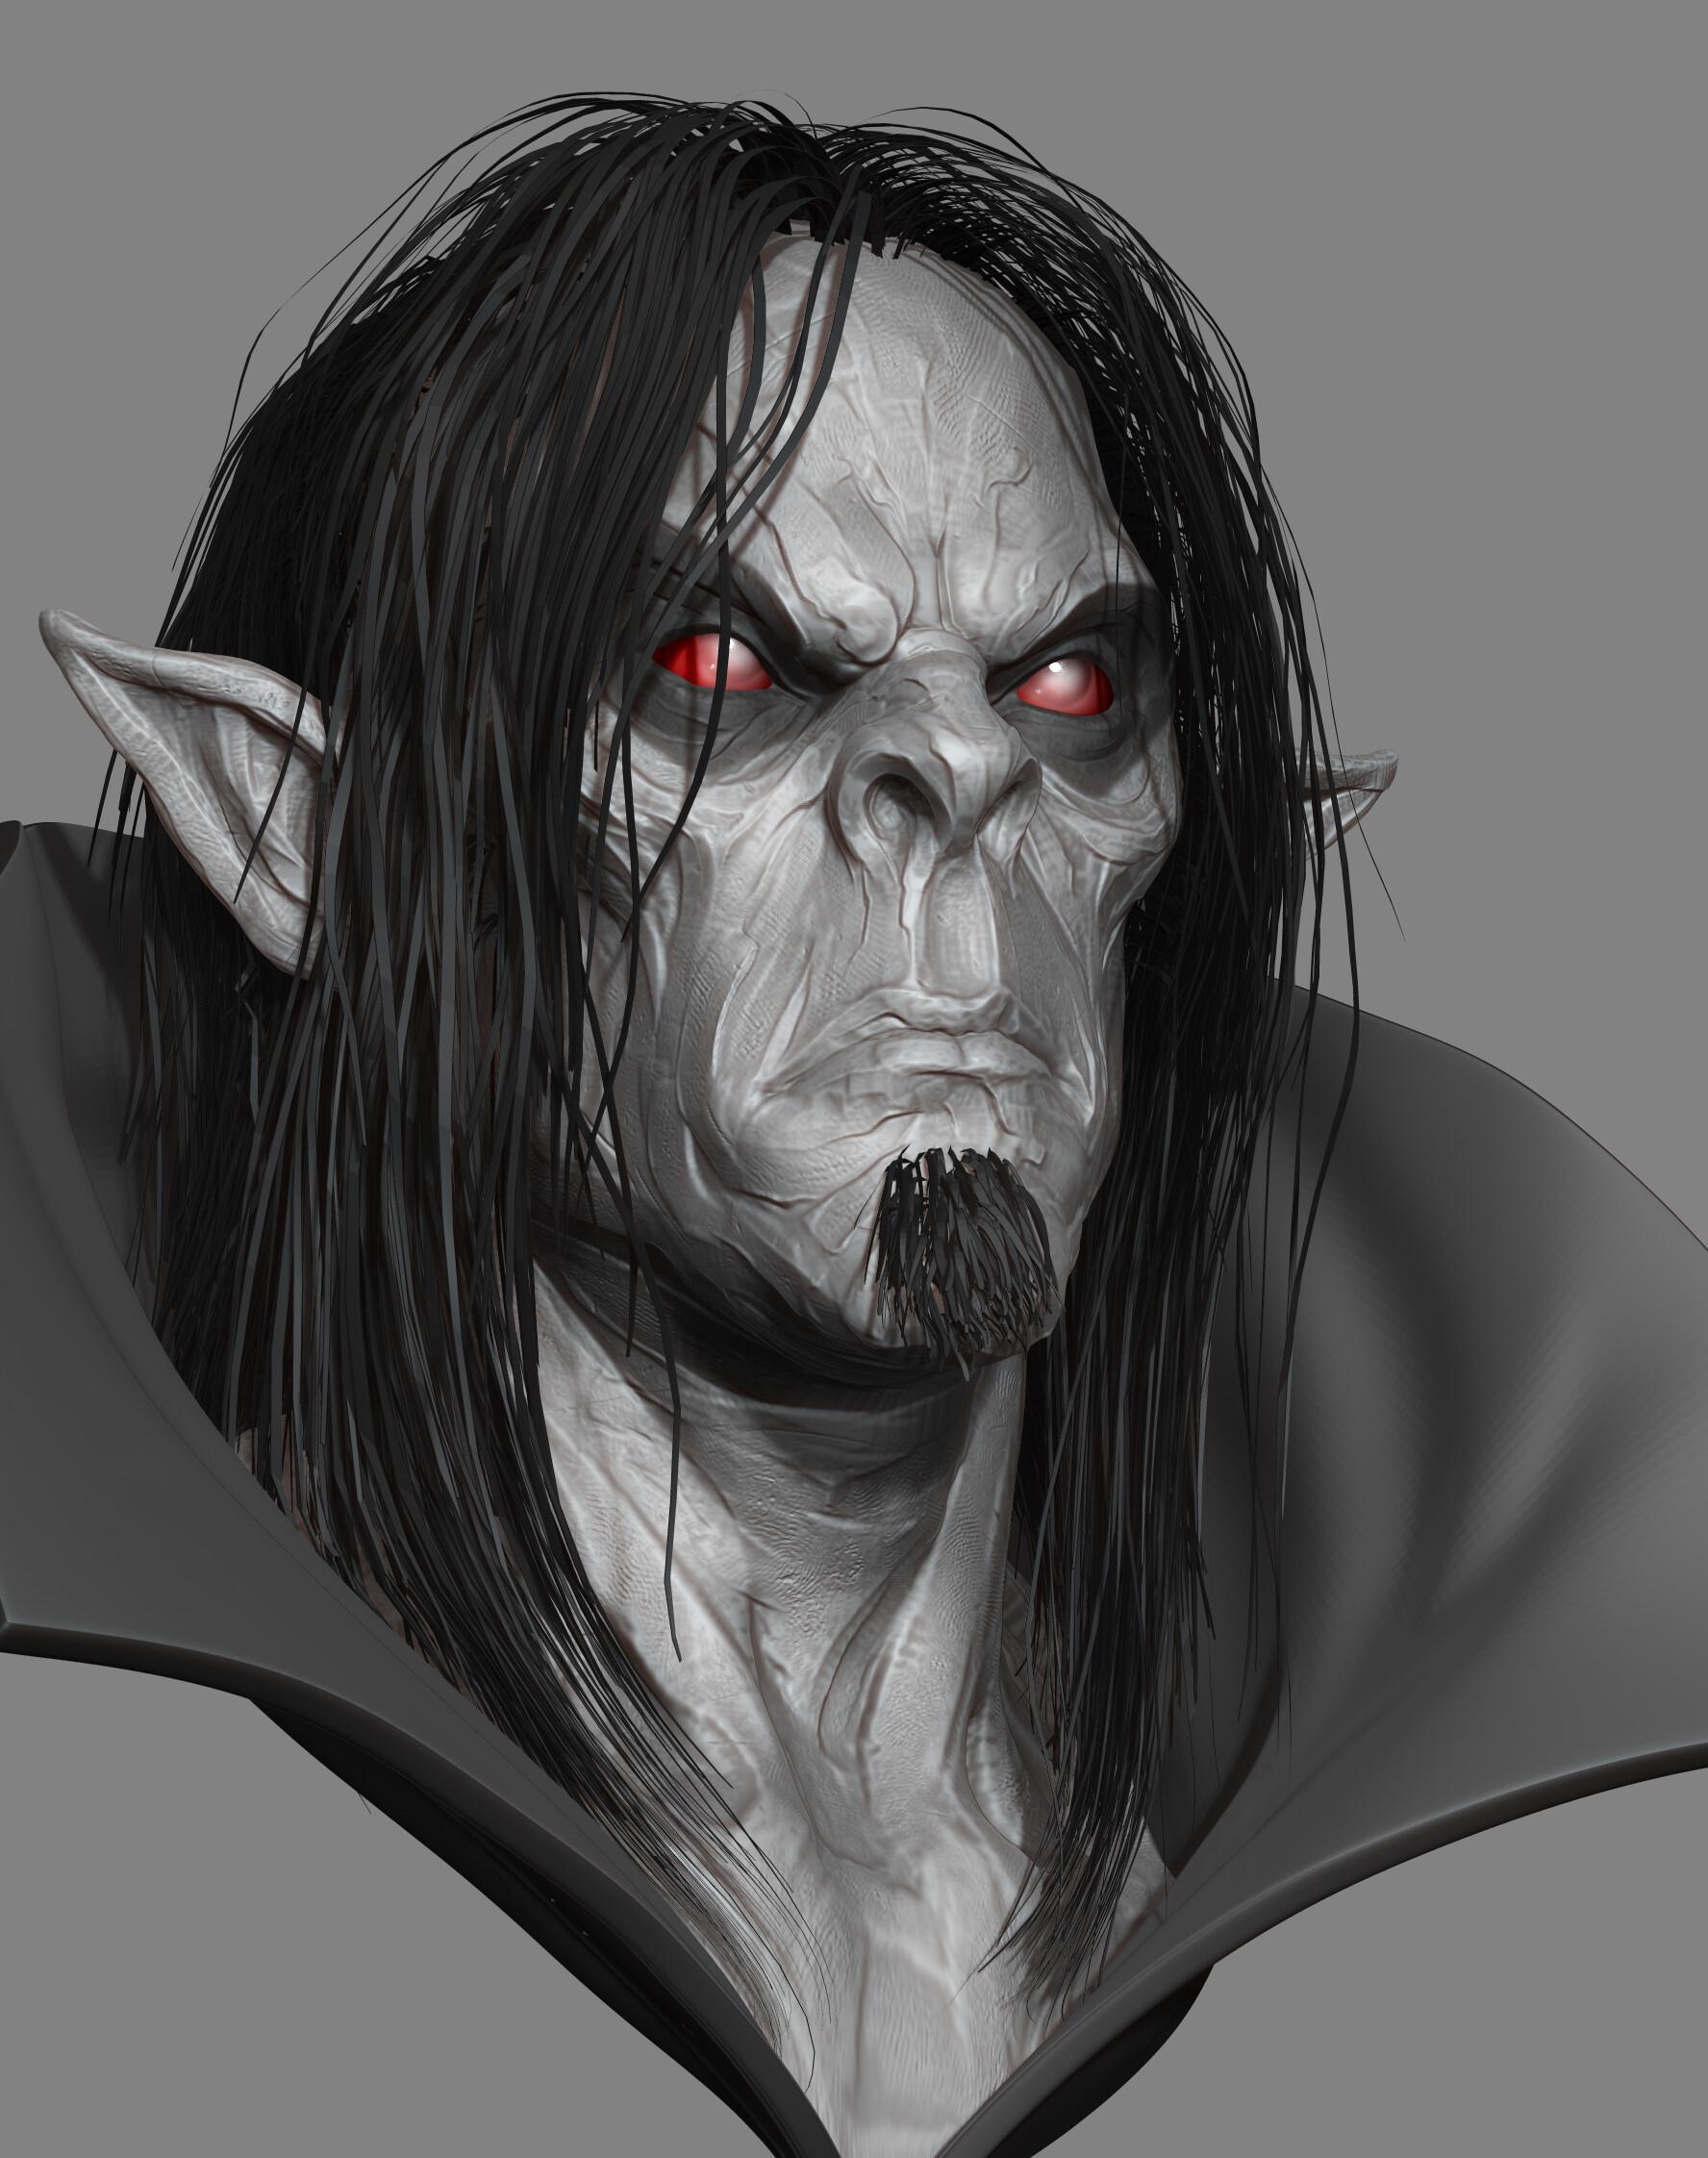 Poligone cg morbius 5